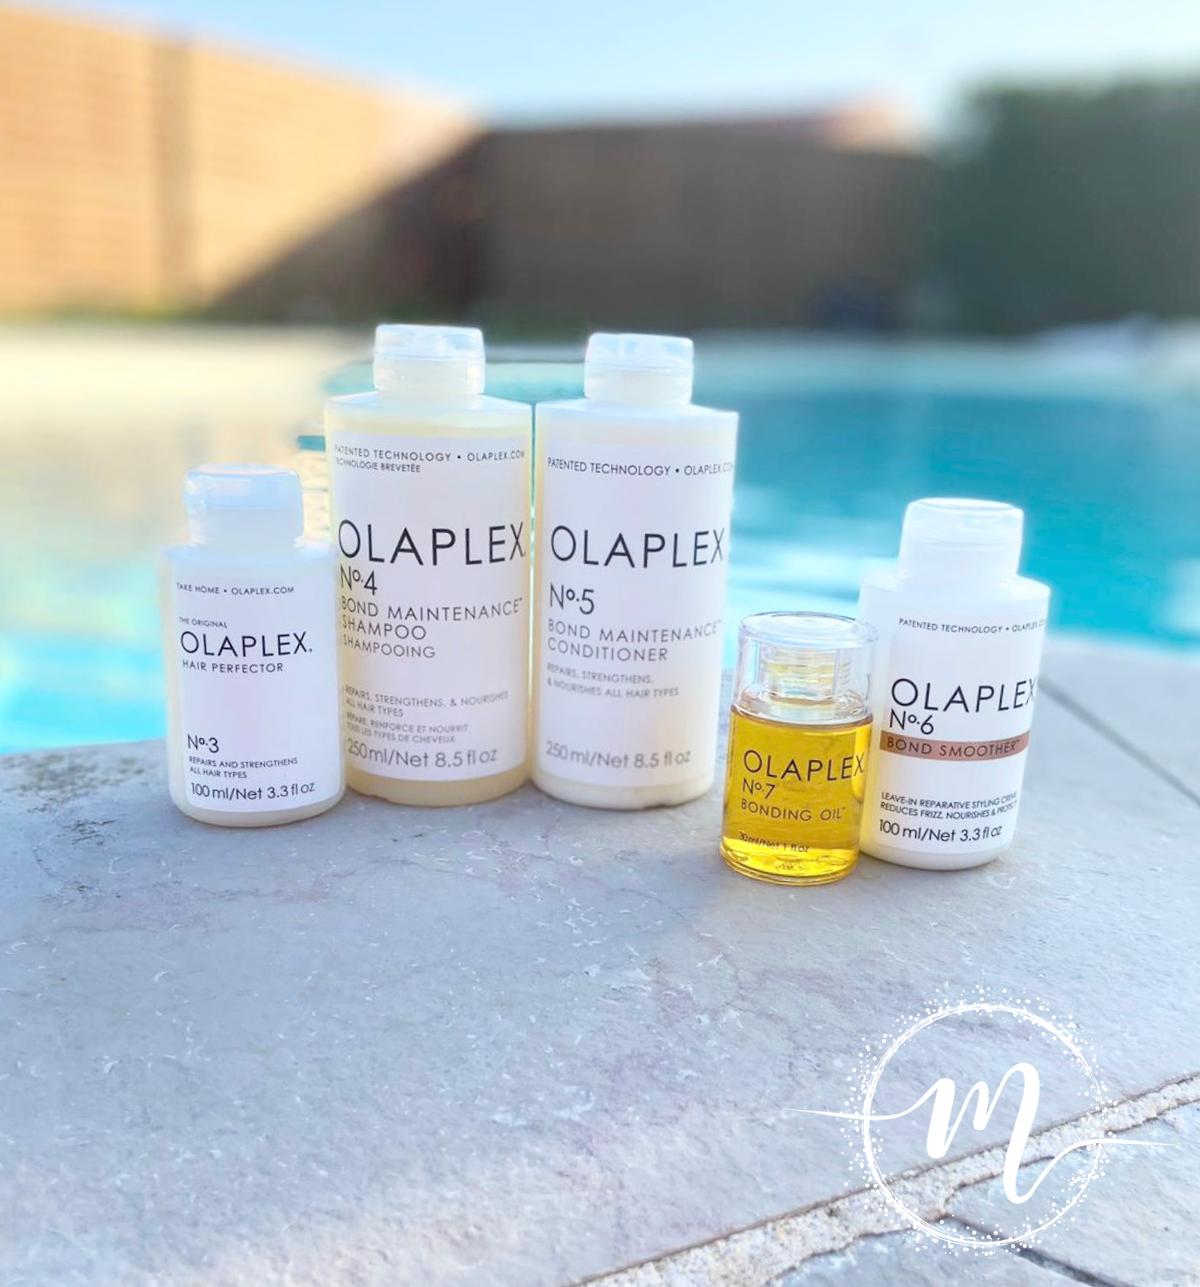 Ma routine Olaplex N°3, N°4, N°5, N°6, N°7/ Soin pré-shampooing + Shampooing réparateur + Conditioner +  Crème coiffante + Huile réparatrice